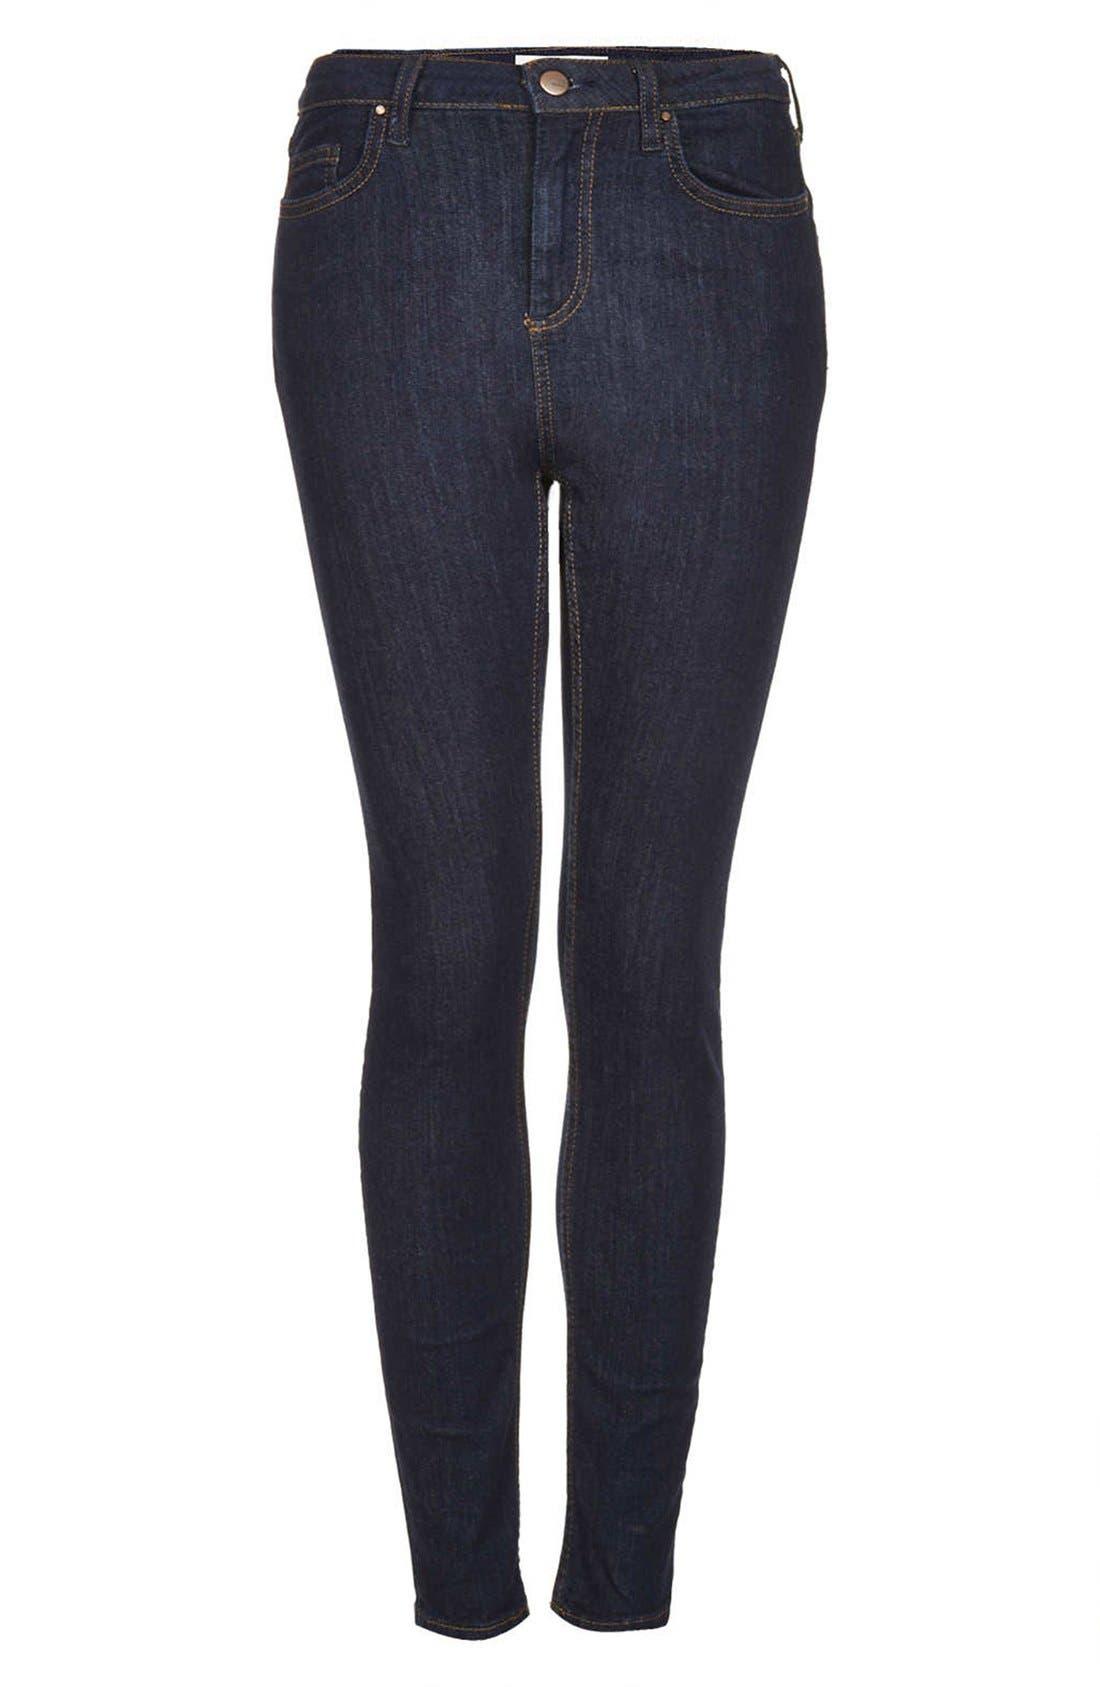 Alternate Image 3  - Topshop Moto 'Jamie' High Rise Skinny Jeans (Blue) (Regular, Short & Long)